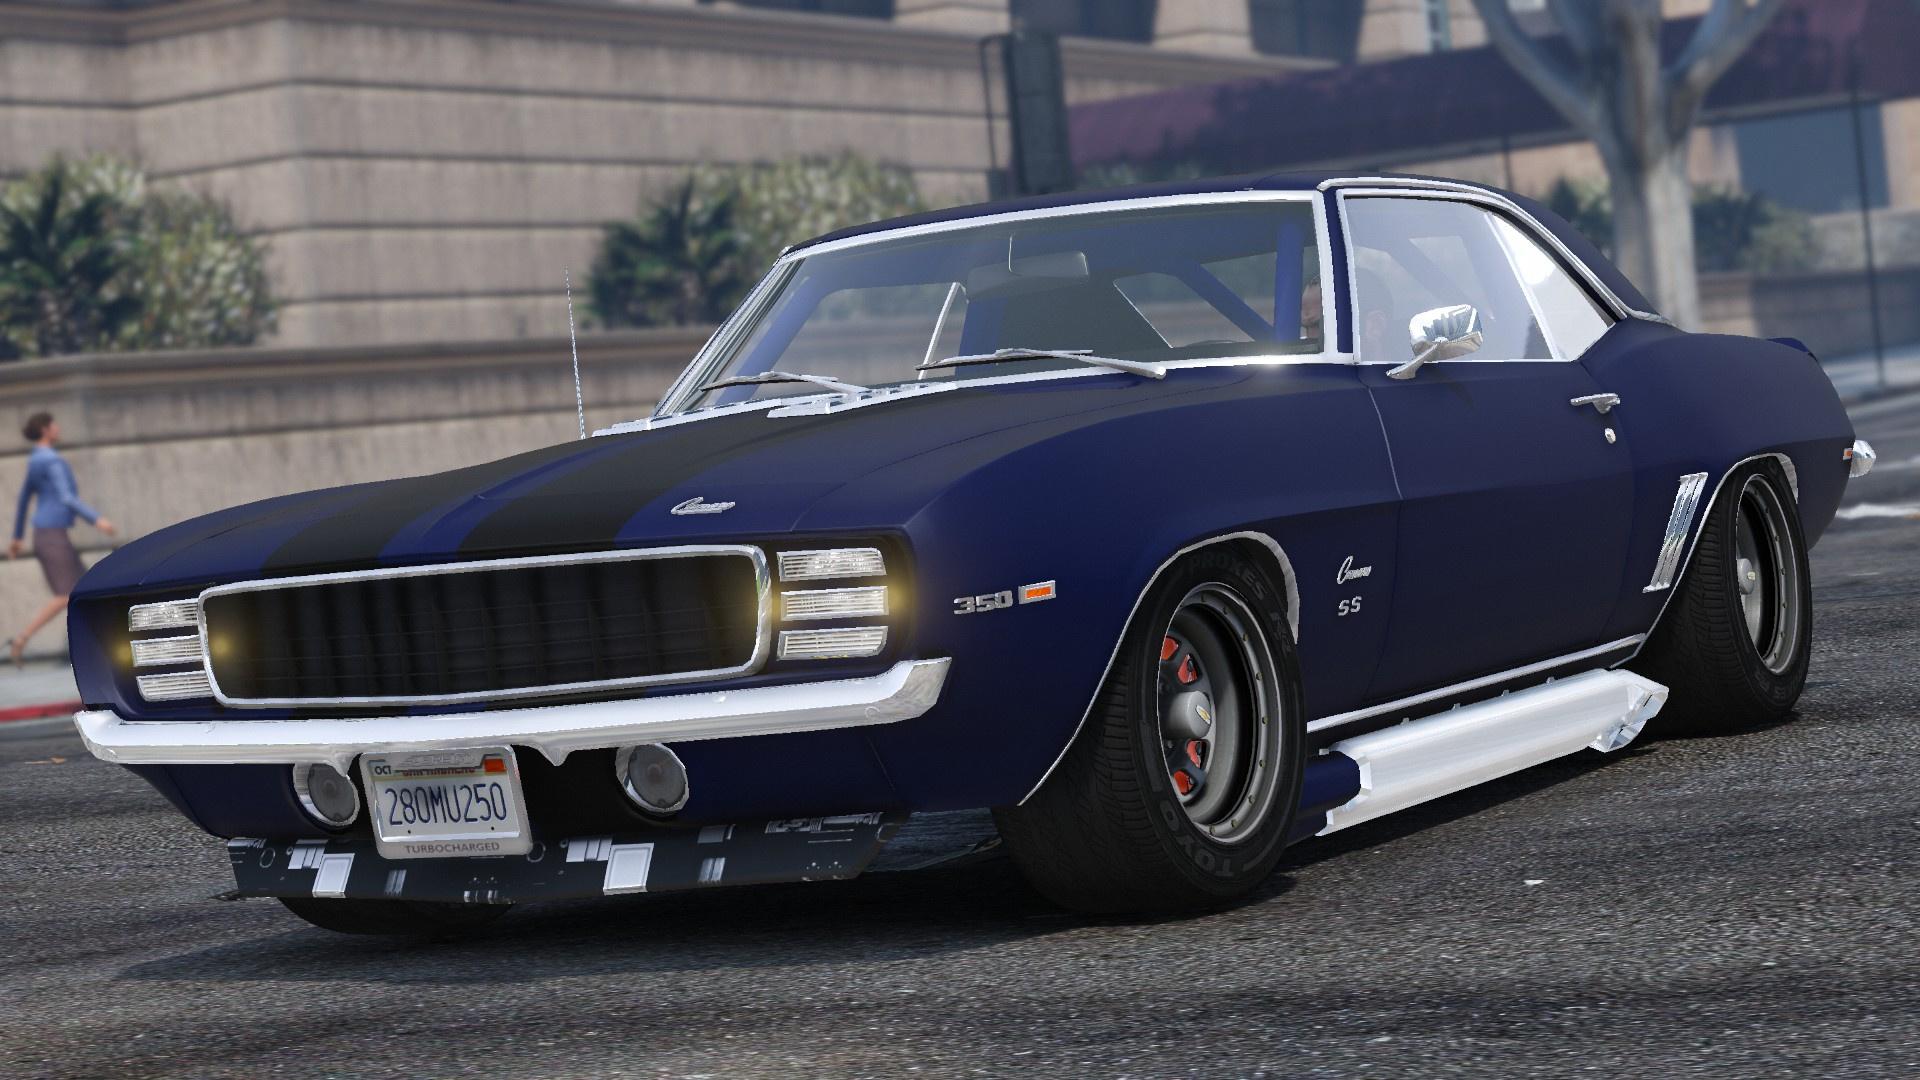 1969 Chevrolet Camaro SS [Add-On] - GTA5-Mods.com